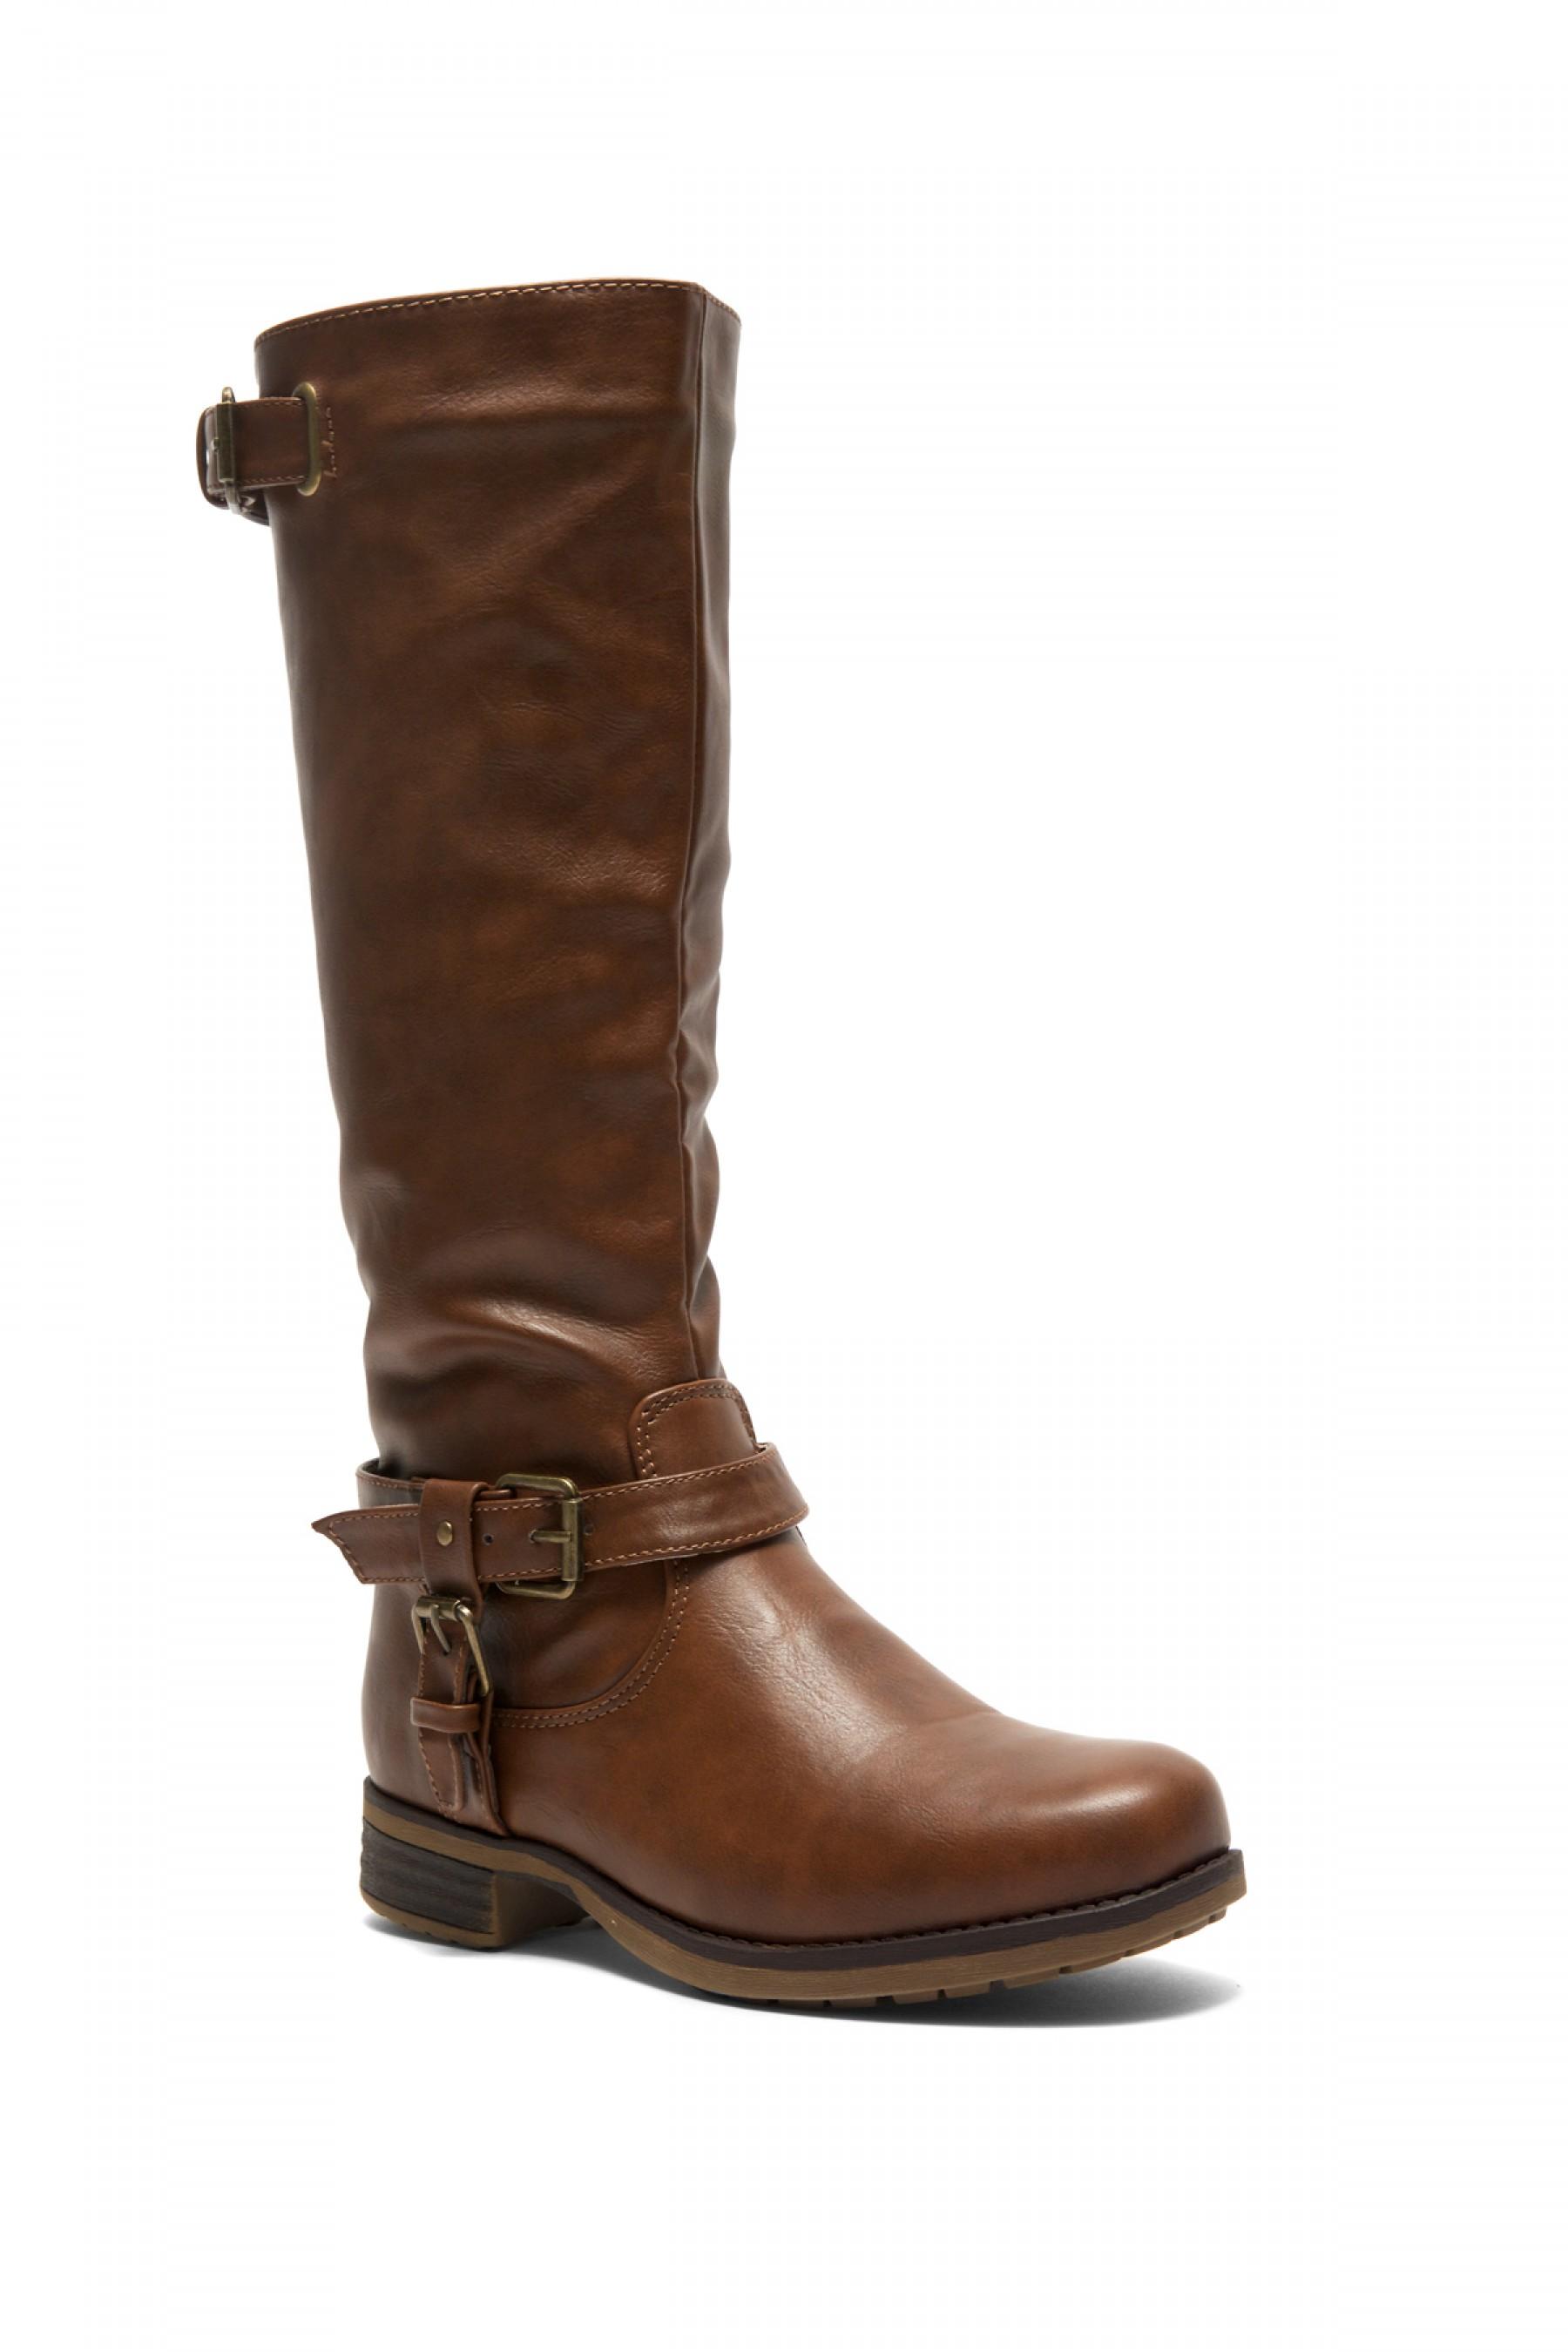 Zayylan Brown Riding Knee high Boots